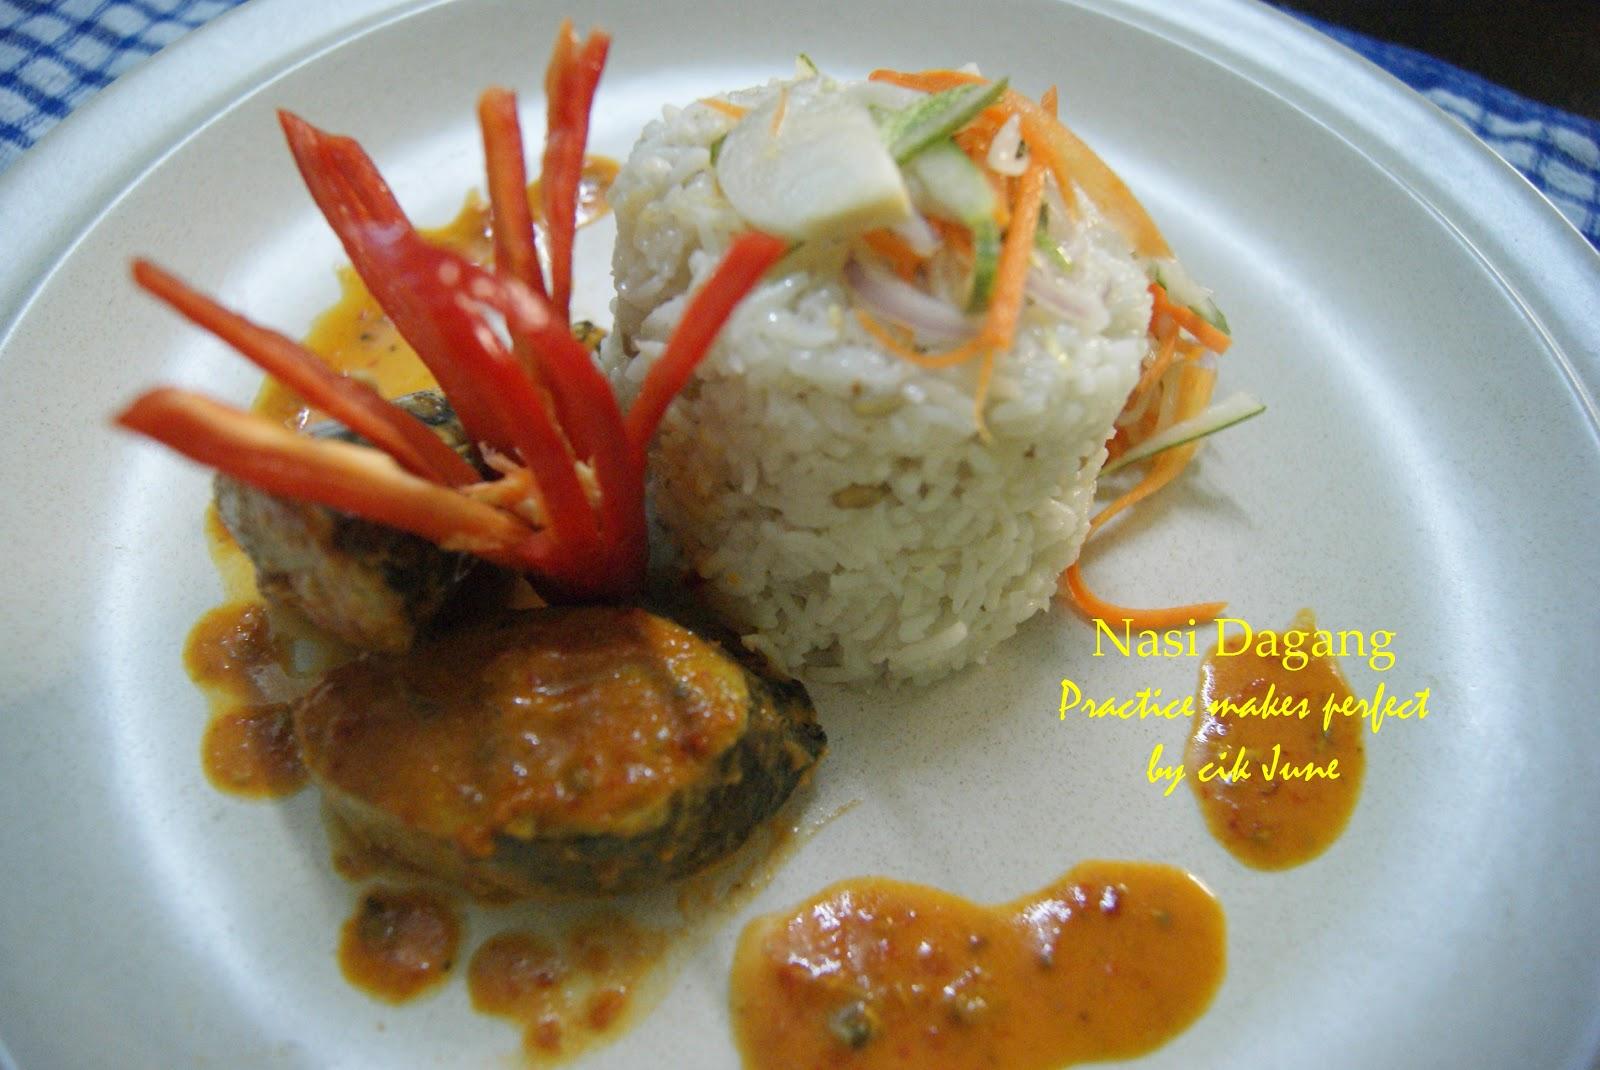 pertama kali diperkenalkan dengan nasi dagang menggantikan nasi lemak